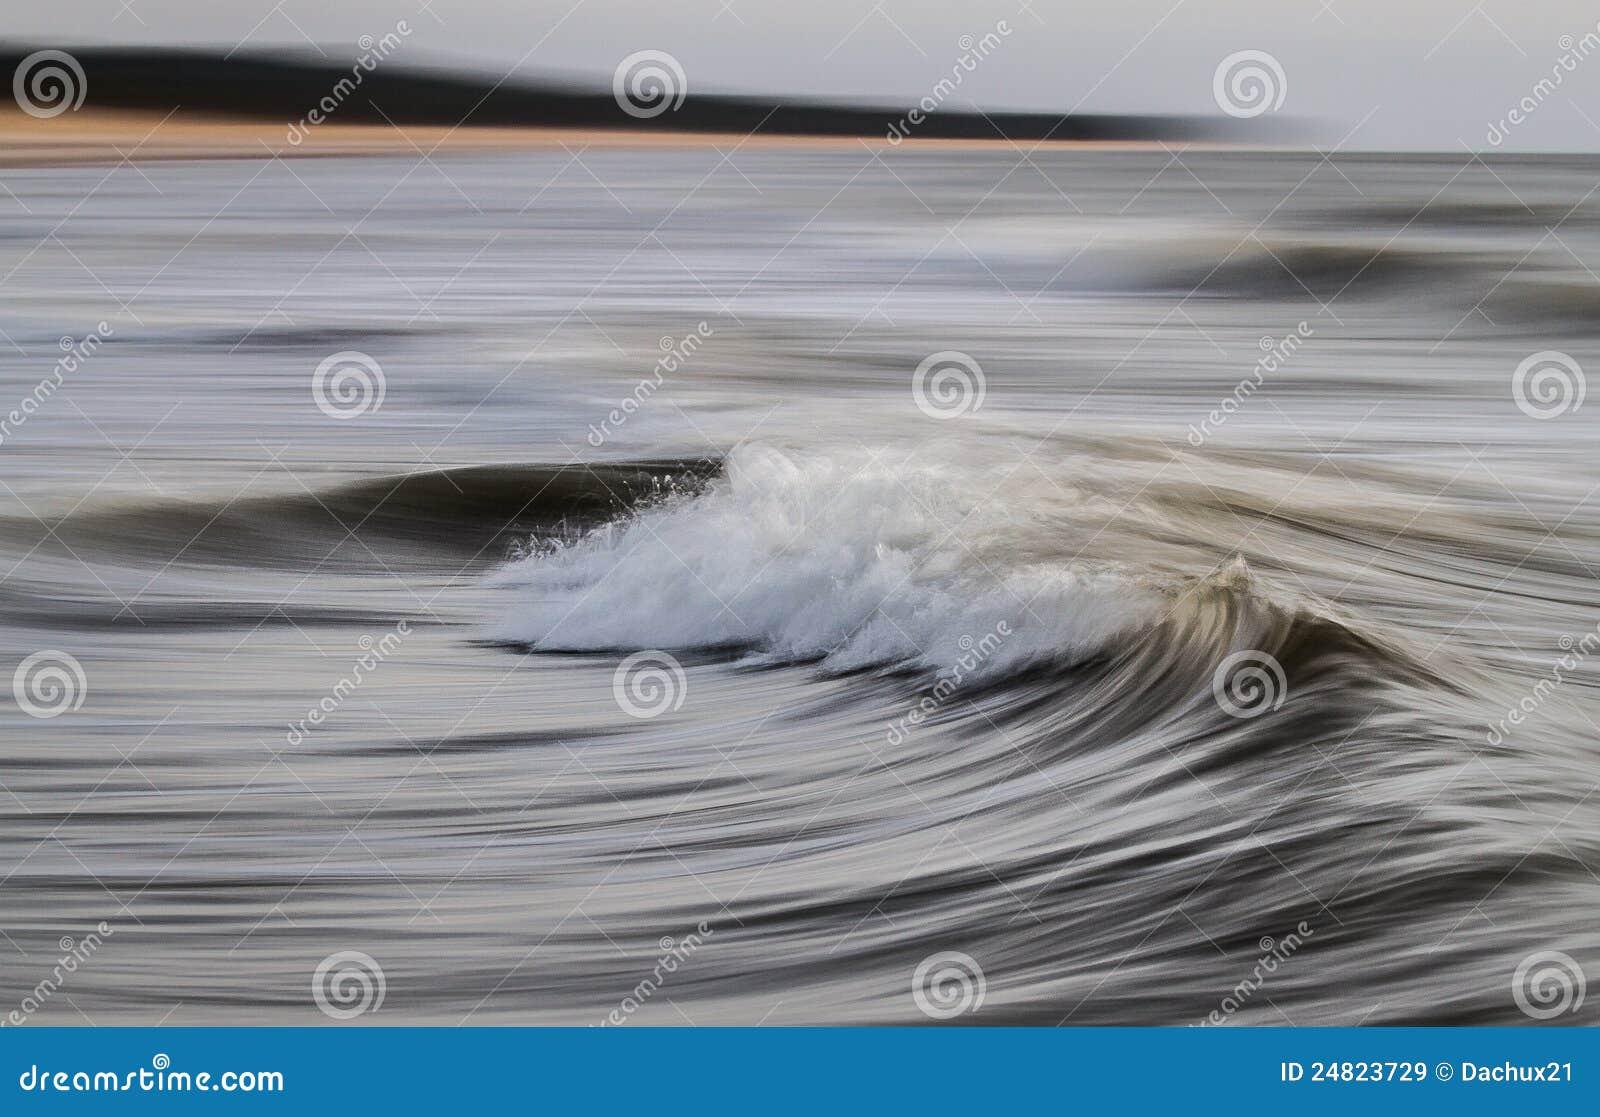 Long exposure shot of sea waves